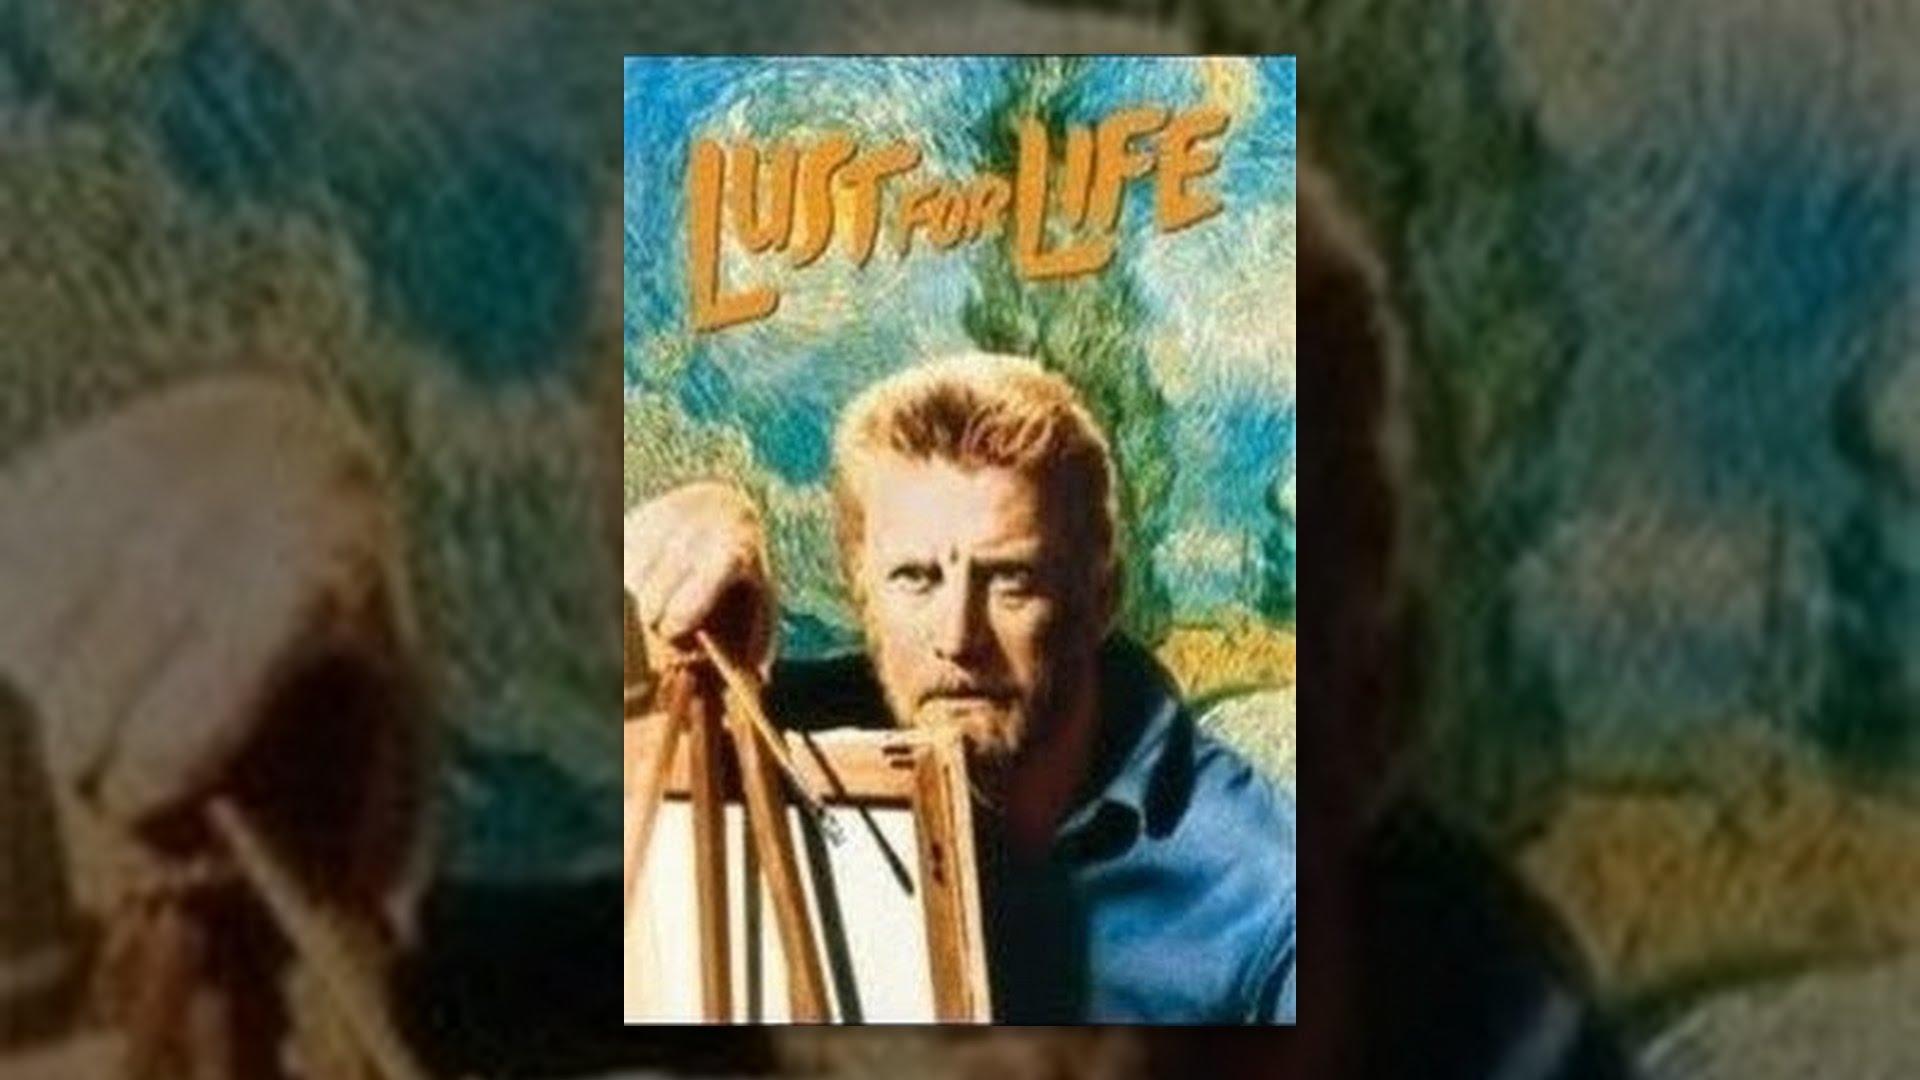 Lust Of Life